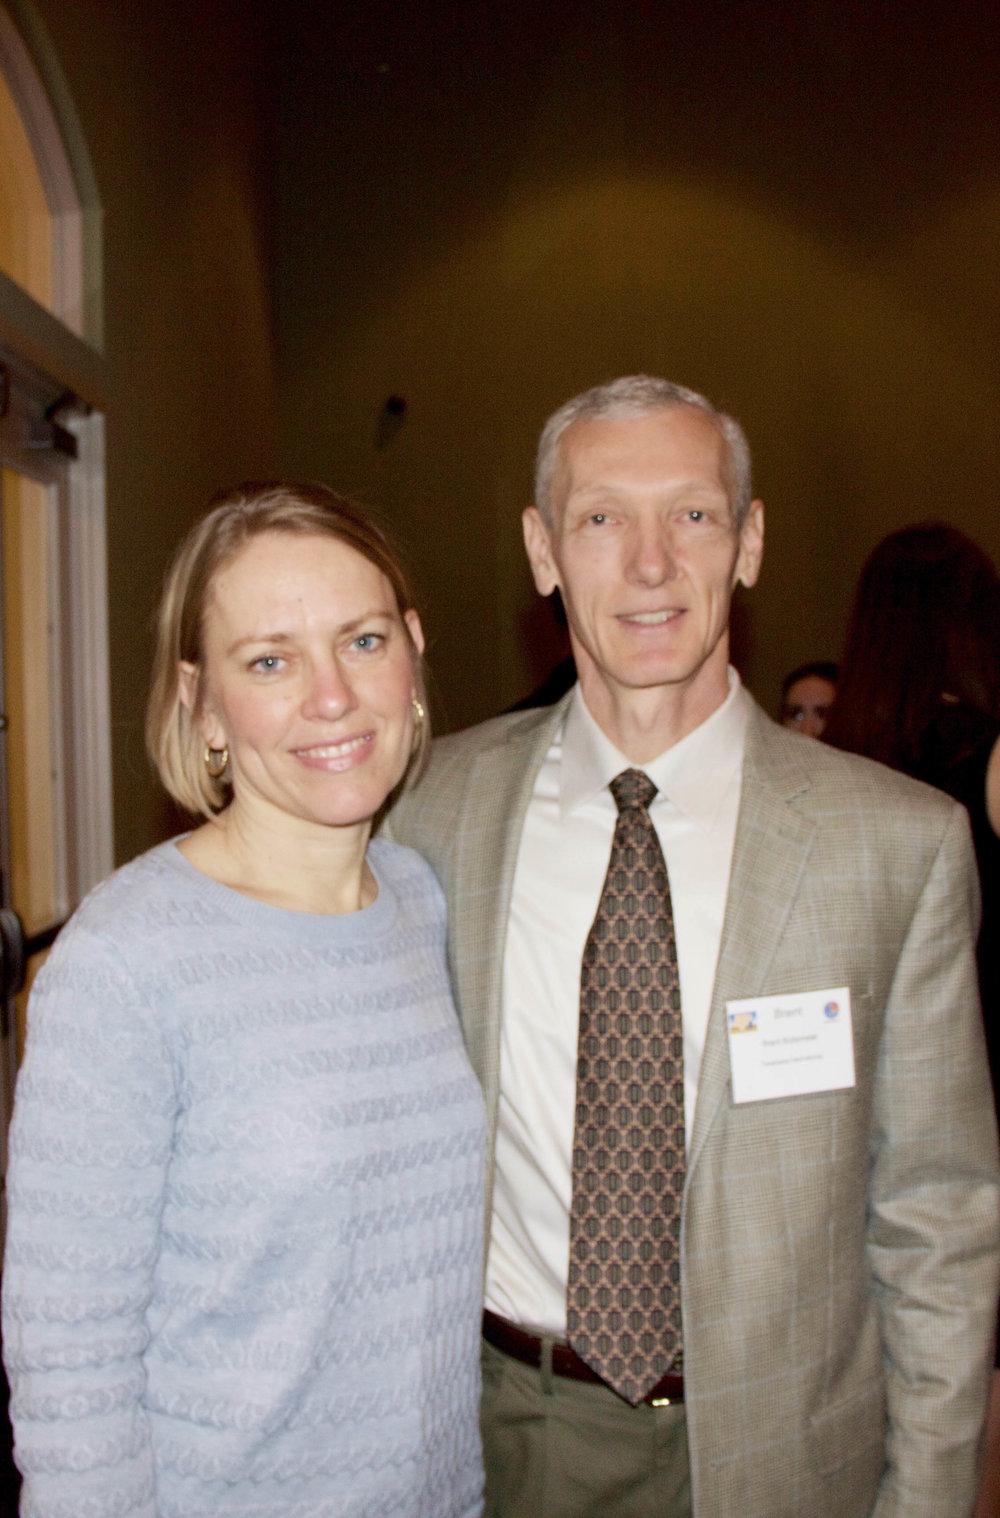 Marie and Brent Boltemeier